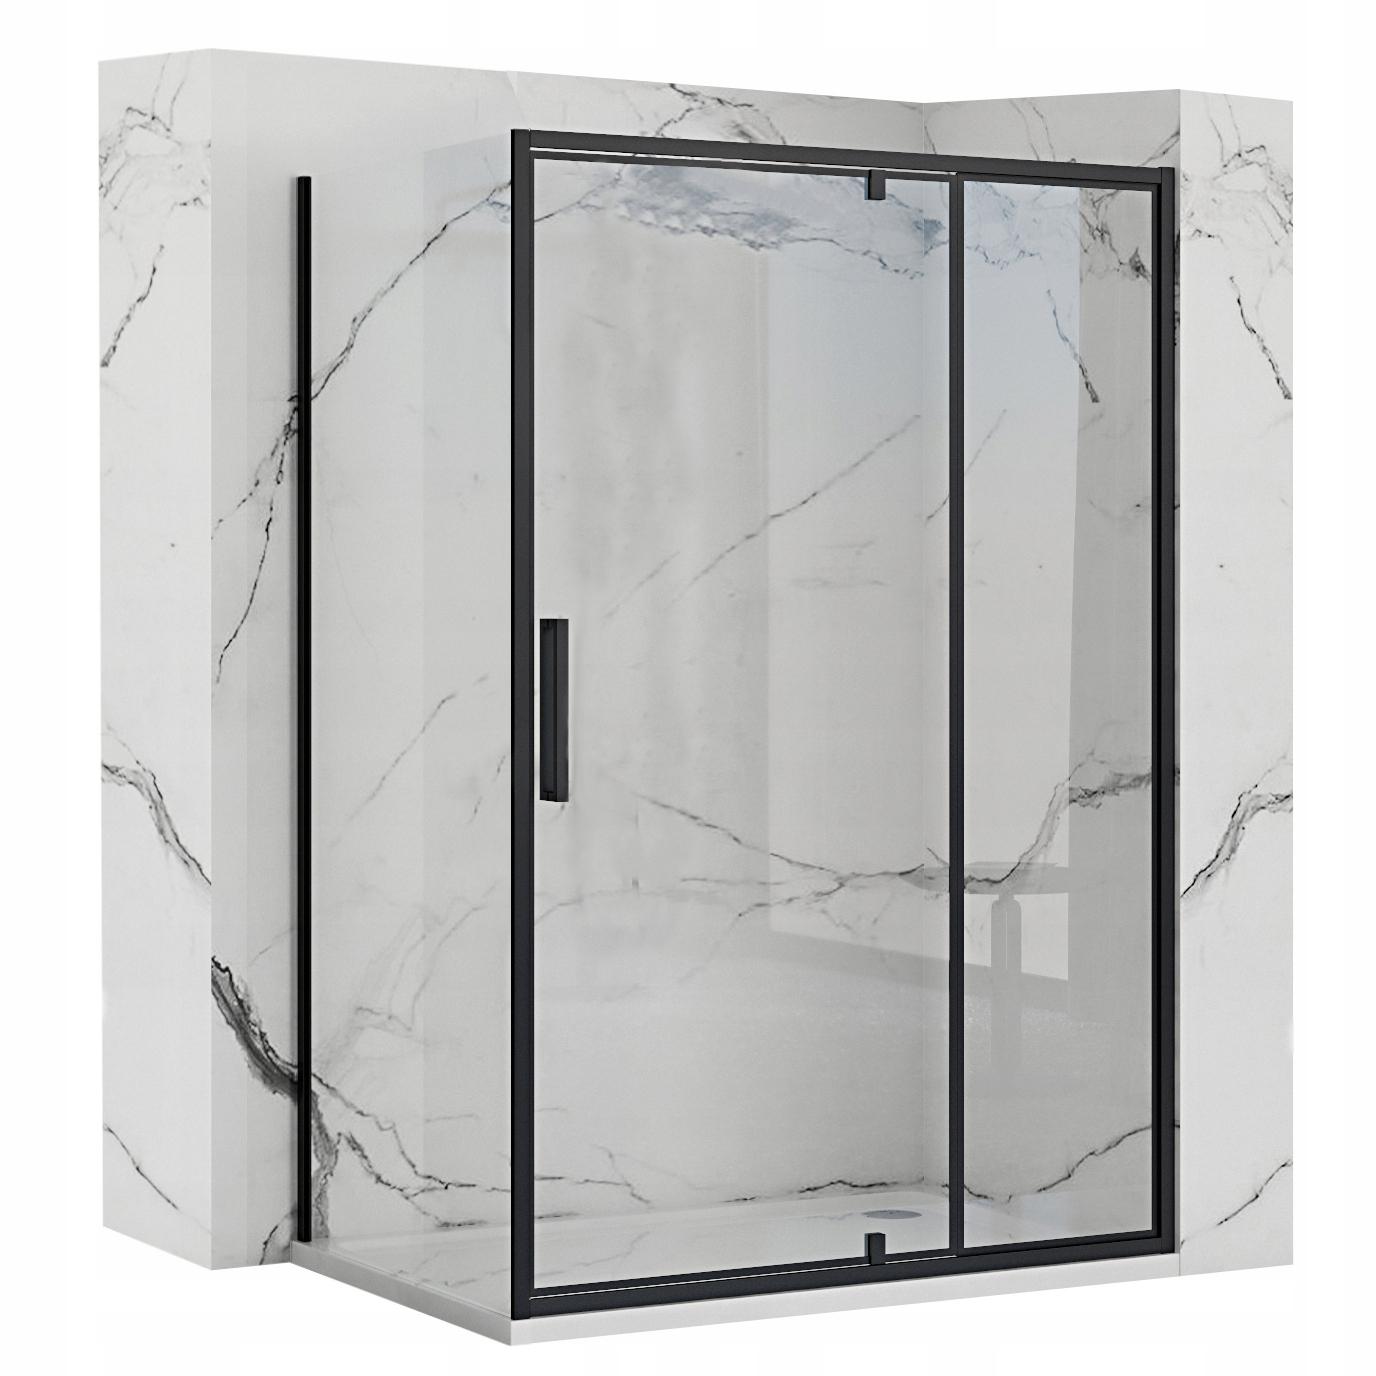 Čierna sprchová kabína Rapid Swing 100x140 cm